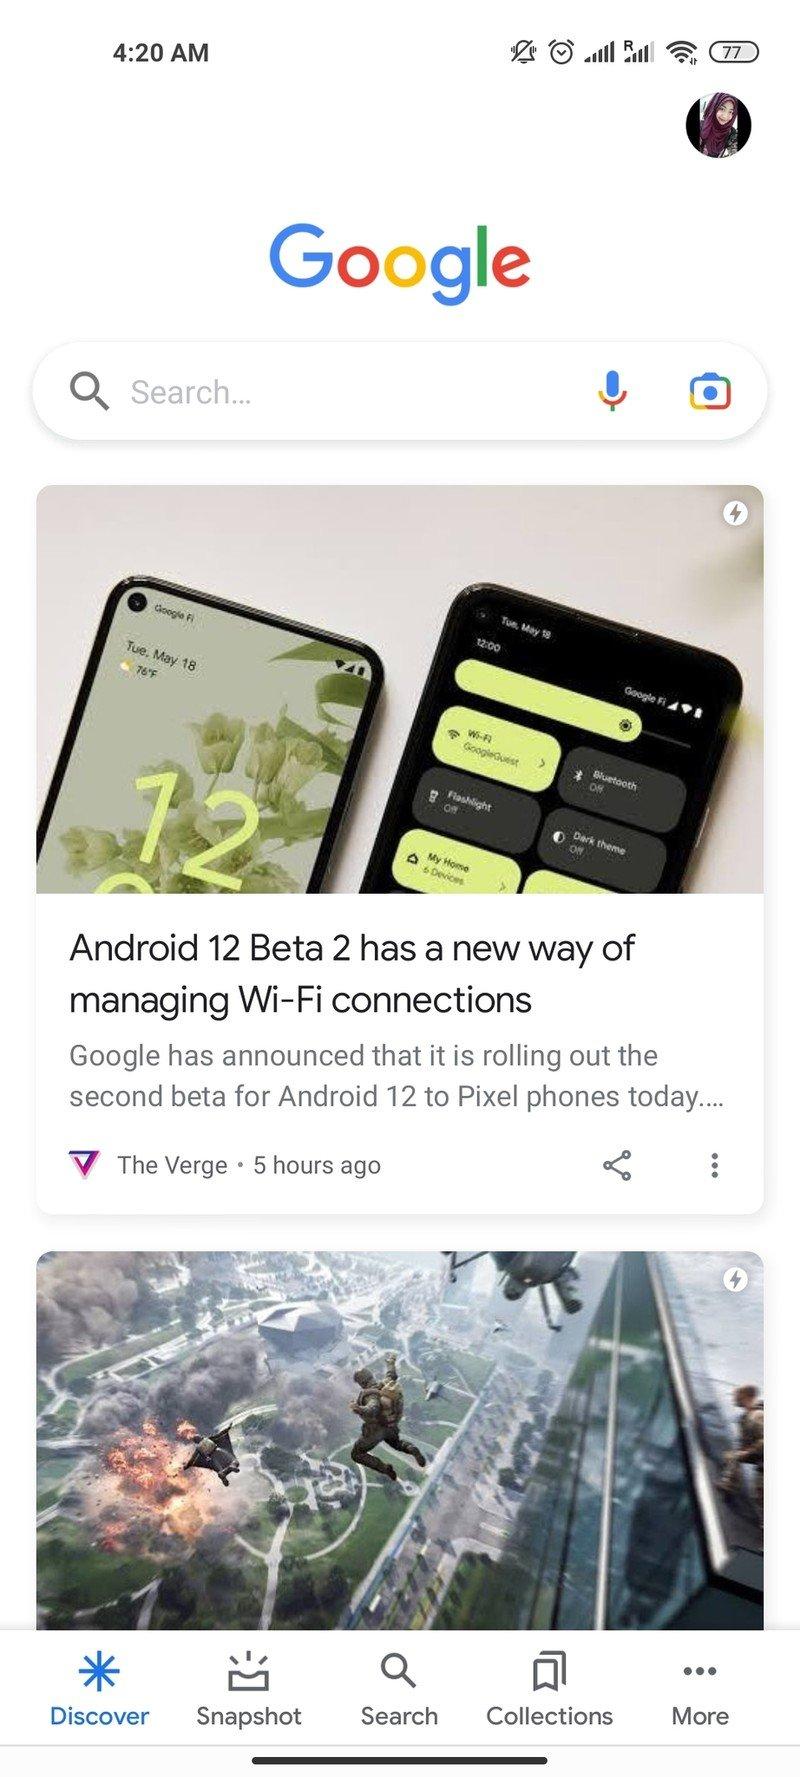 android-google-app-screenshot.jpg